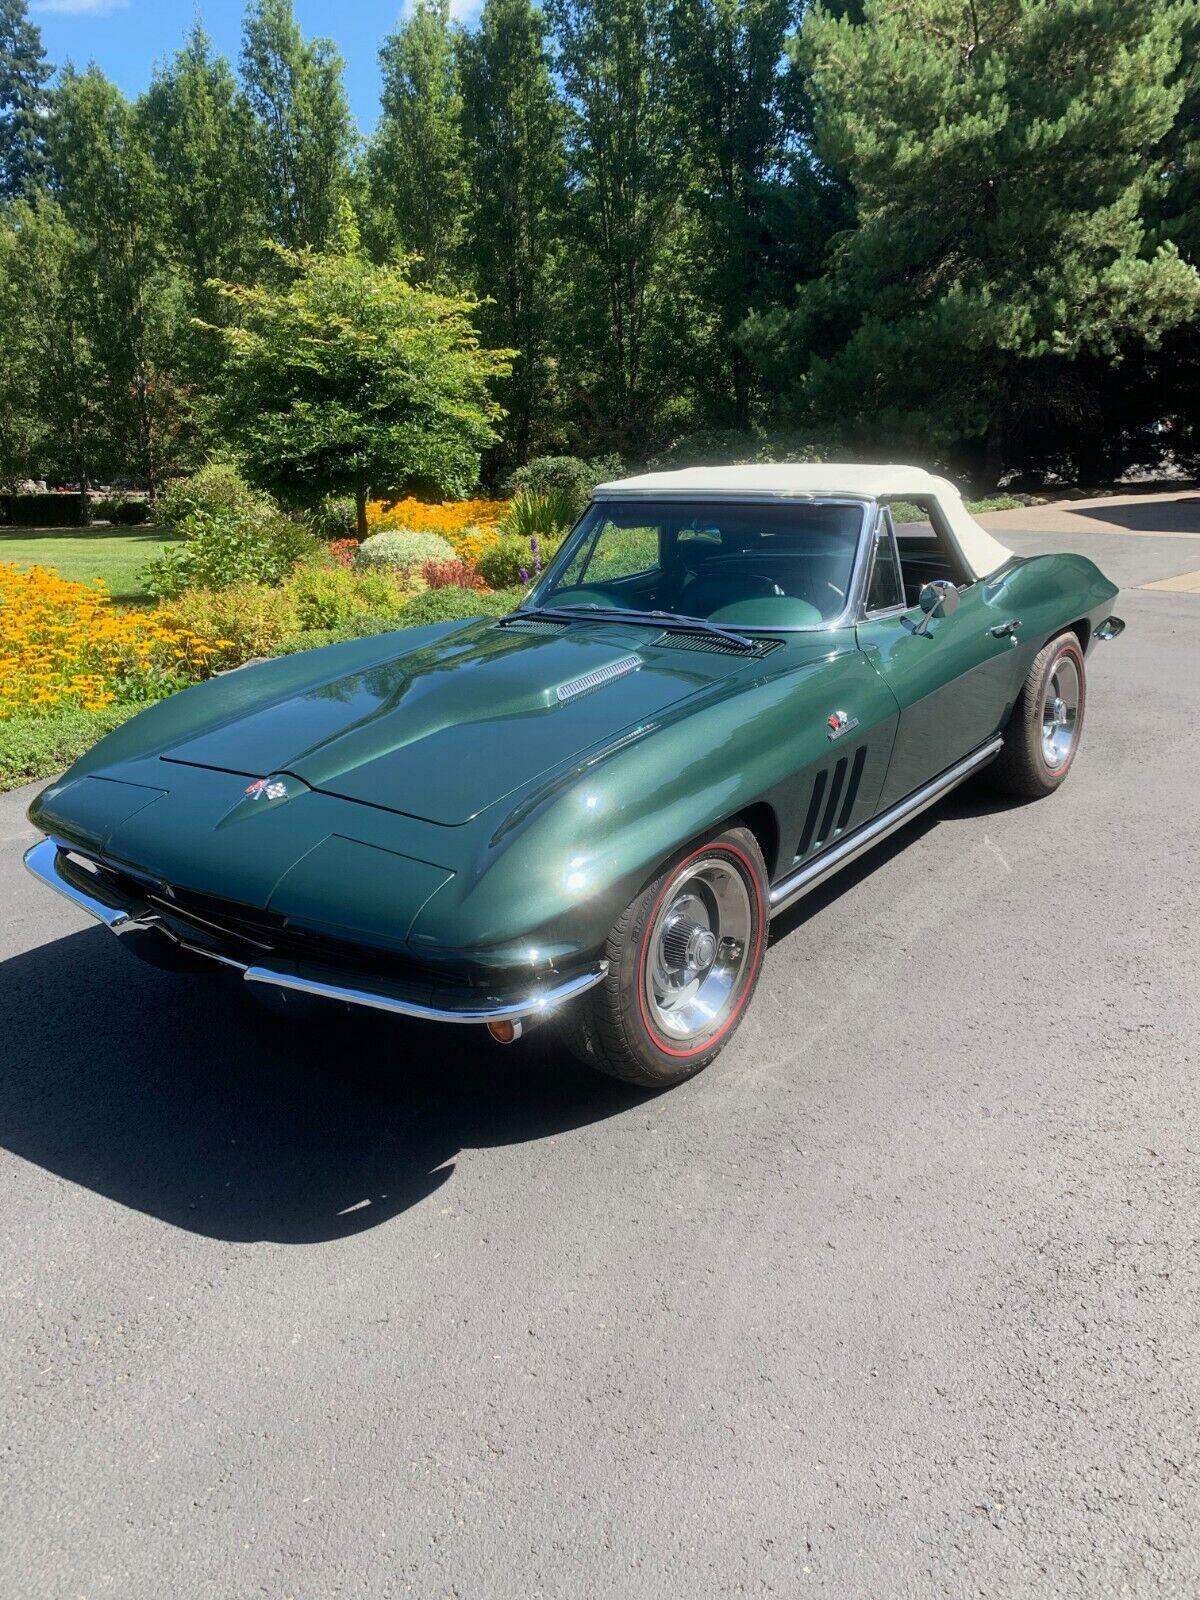 1965  Chevrolet Corvette   | C2 Corvette Photo 1